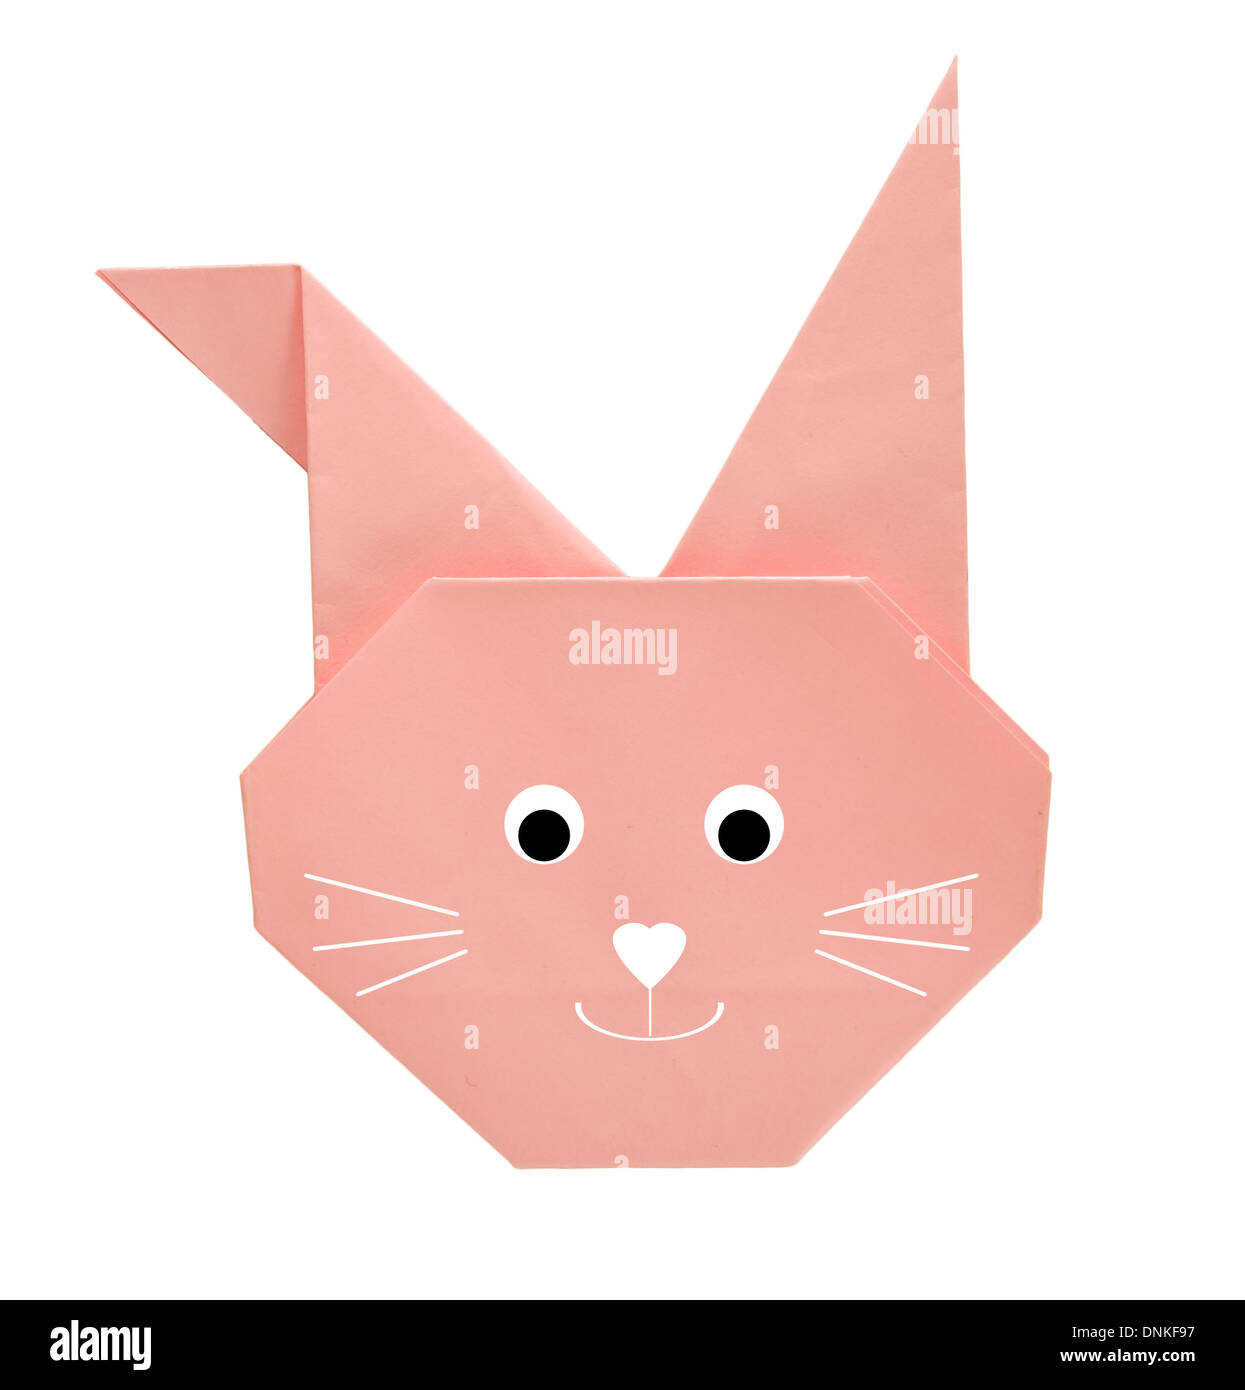 Kawaii Origami: Super Cute Origami Projects for Easy Folding Fun:  Amazon.de: Pushkin, Chrissy: Fremdsprachige Bücher | 1390x1245